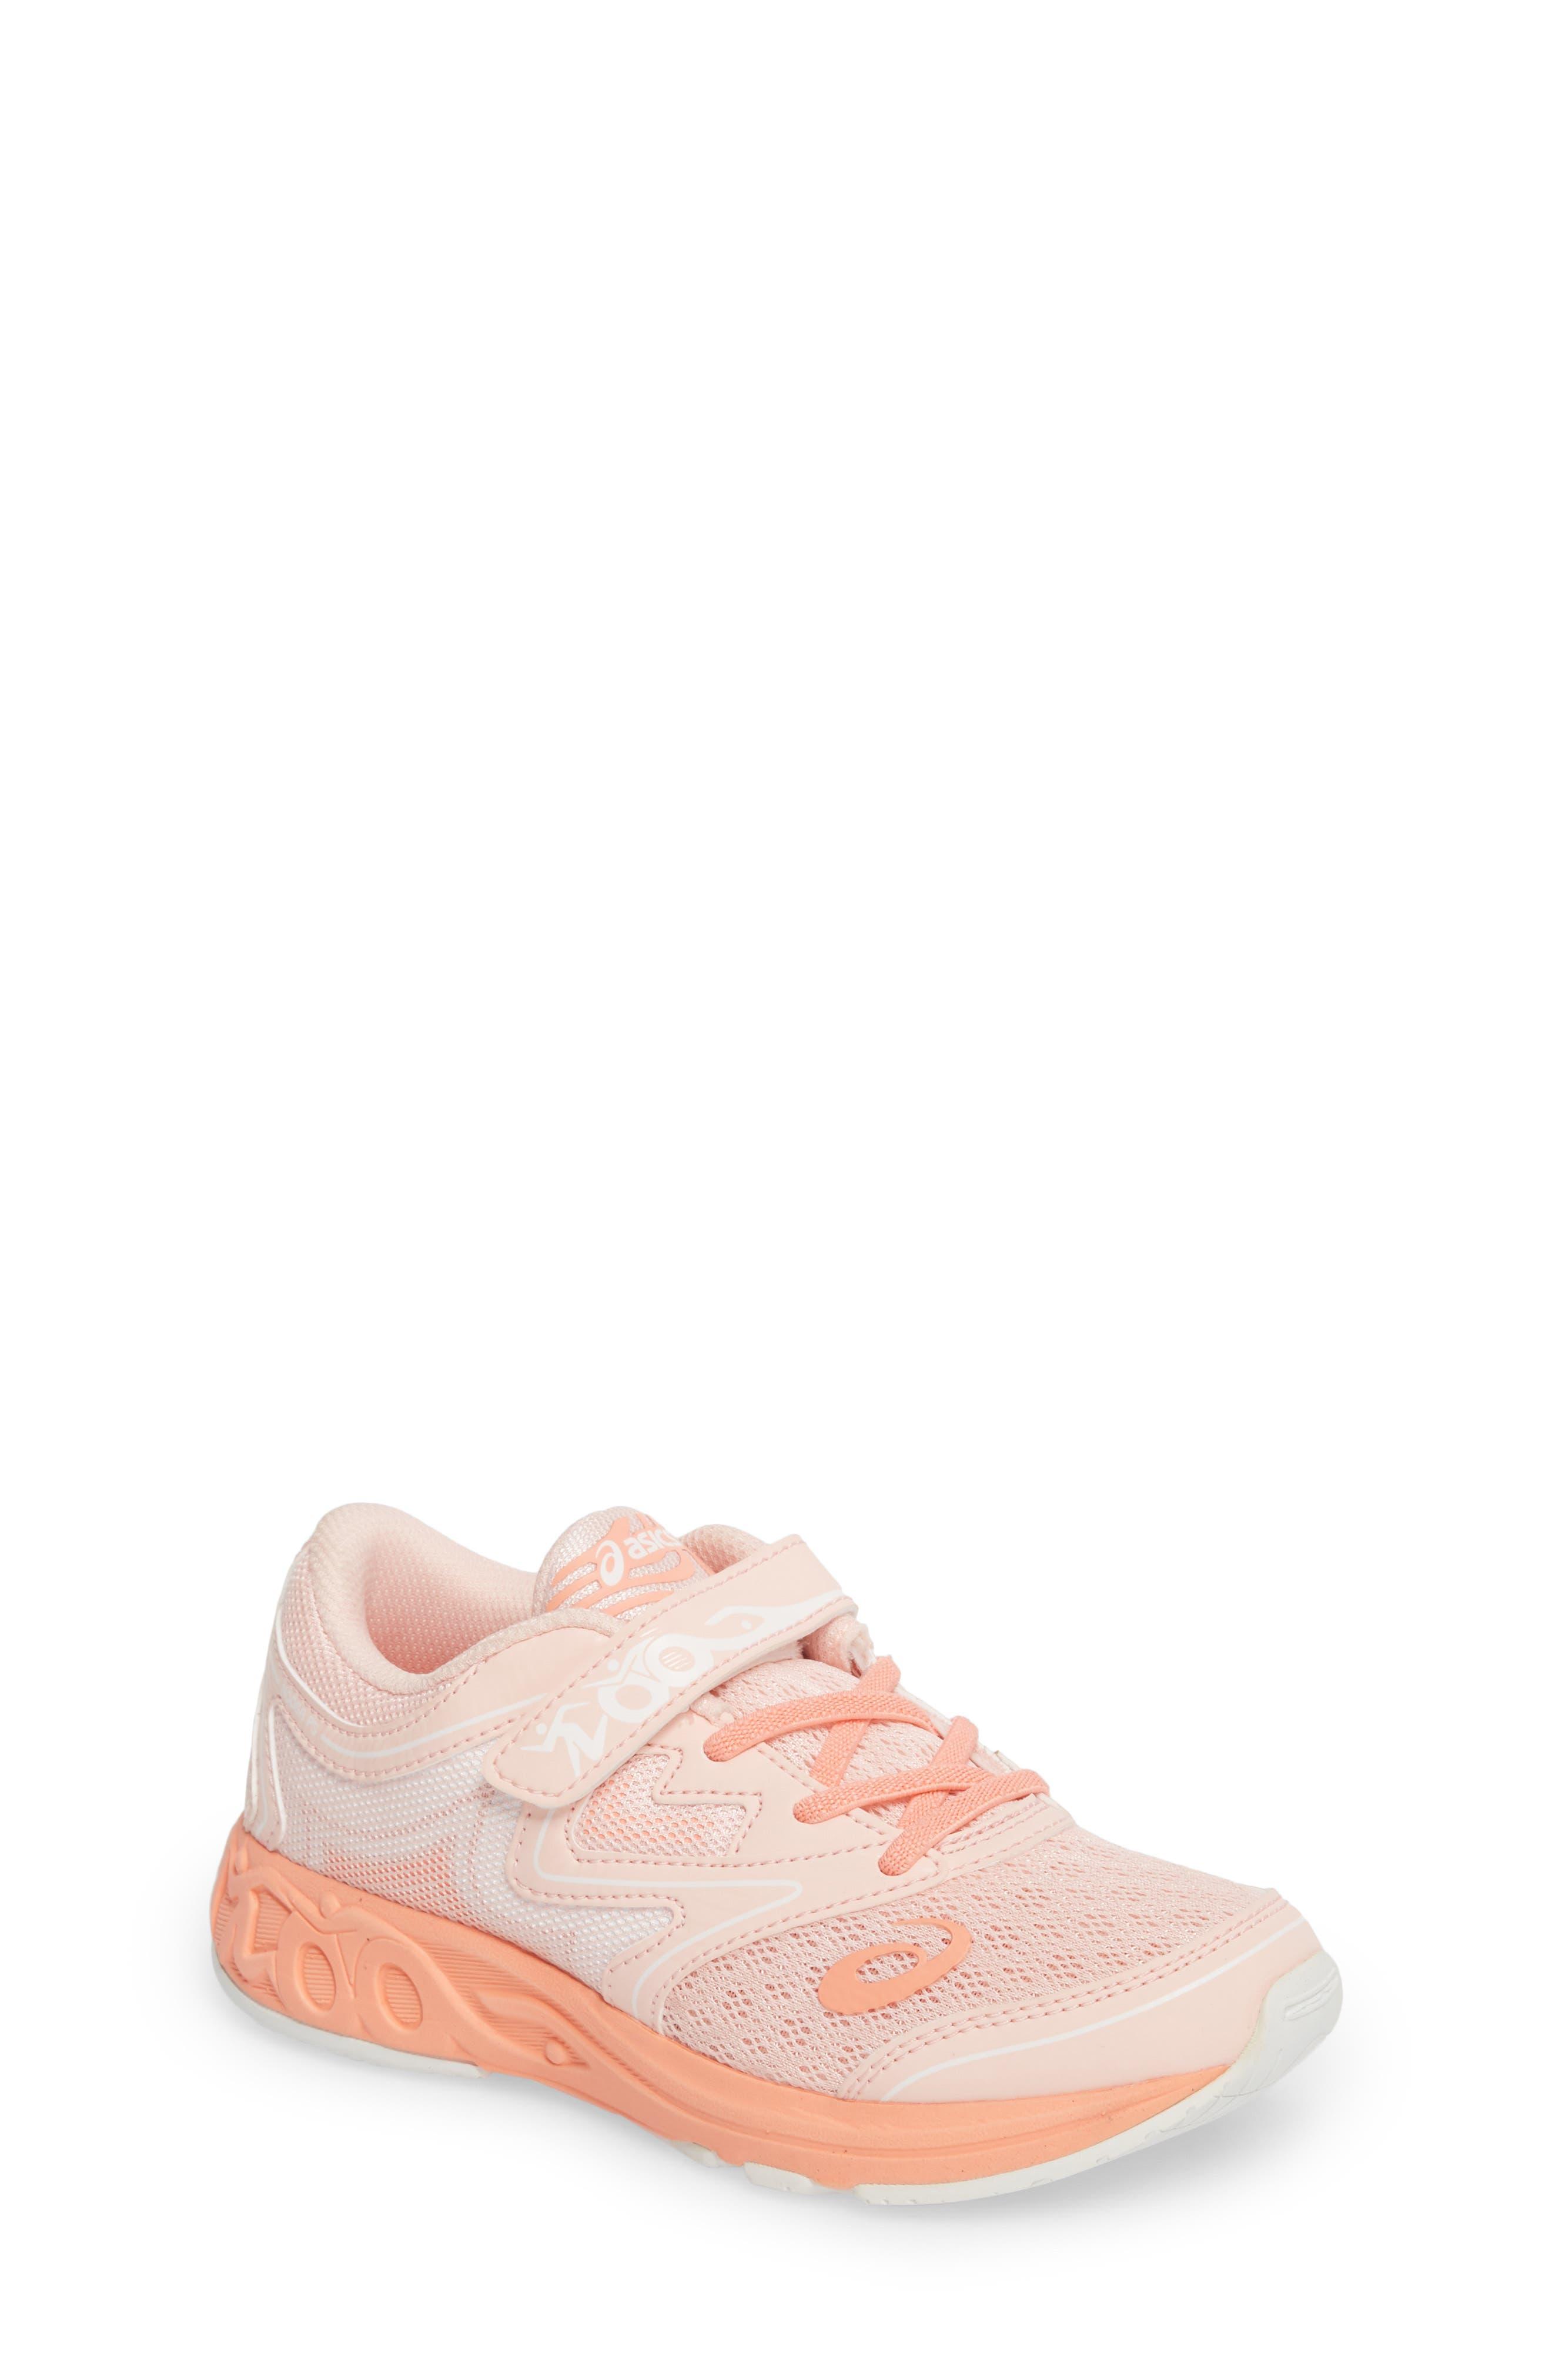 Noosa PS Sneaker,                             Main thumbnail 1, color,                             Seashell Pink/ Begonia/ White